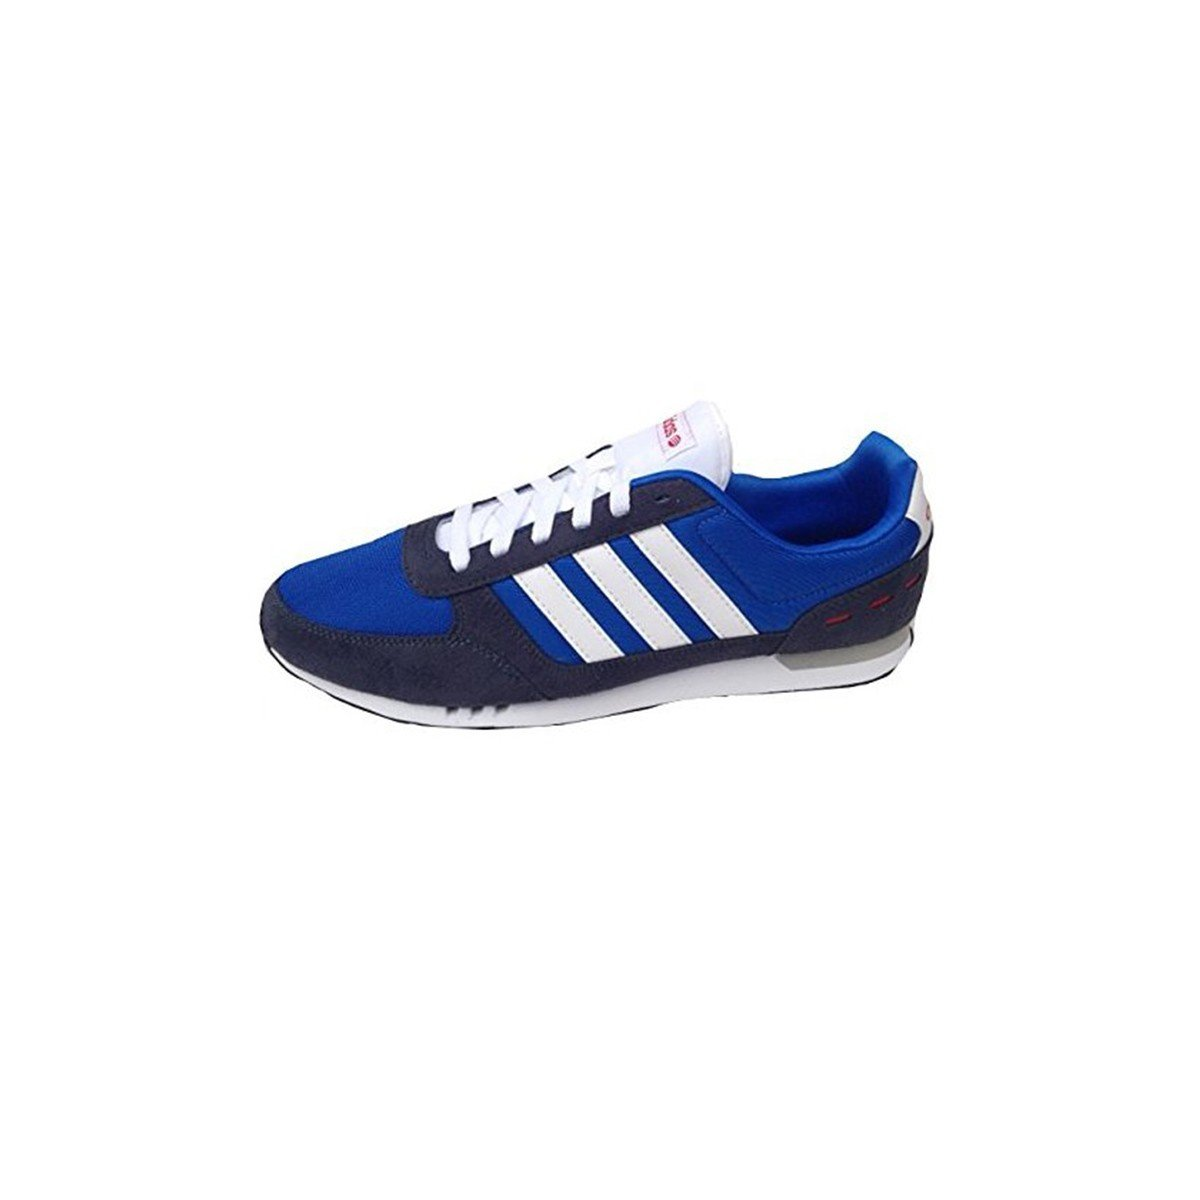 adidas Scarpe Uomo Sneakers NEO City in Tela blu F37931 ...